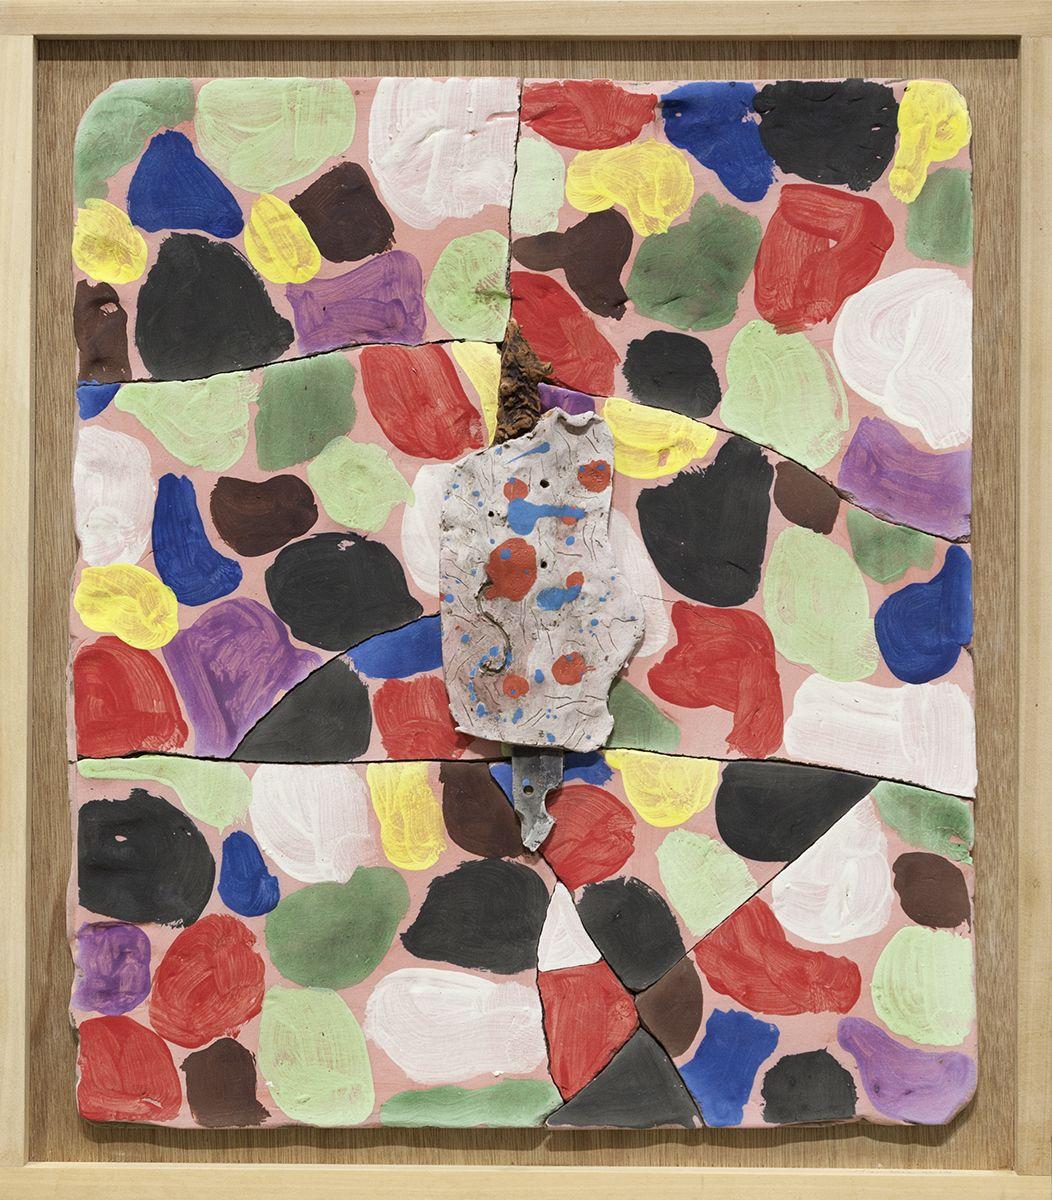 Richard Hawkins  Baby Diaper and Dagger Weapon Against Succubi, 2016  Glazed ceramic in artist's frame   22 3/4 x 25 3/4 x 3 1/2 inches (57.8 x 65.4 x 8.9 cm)